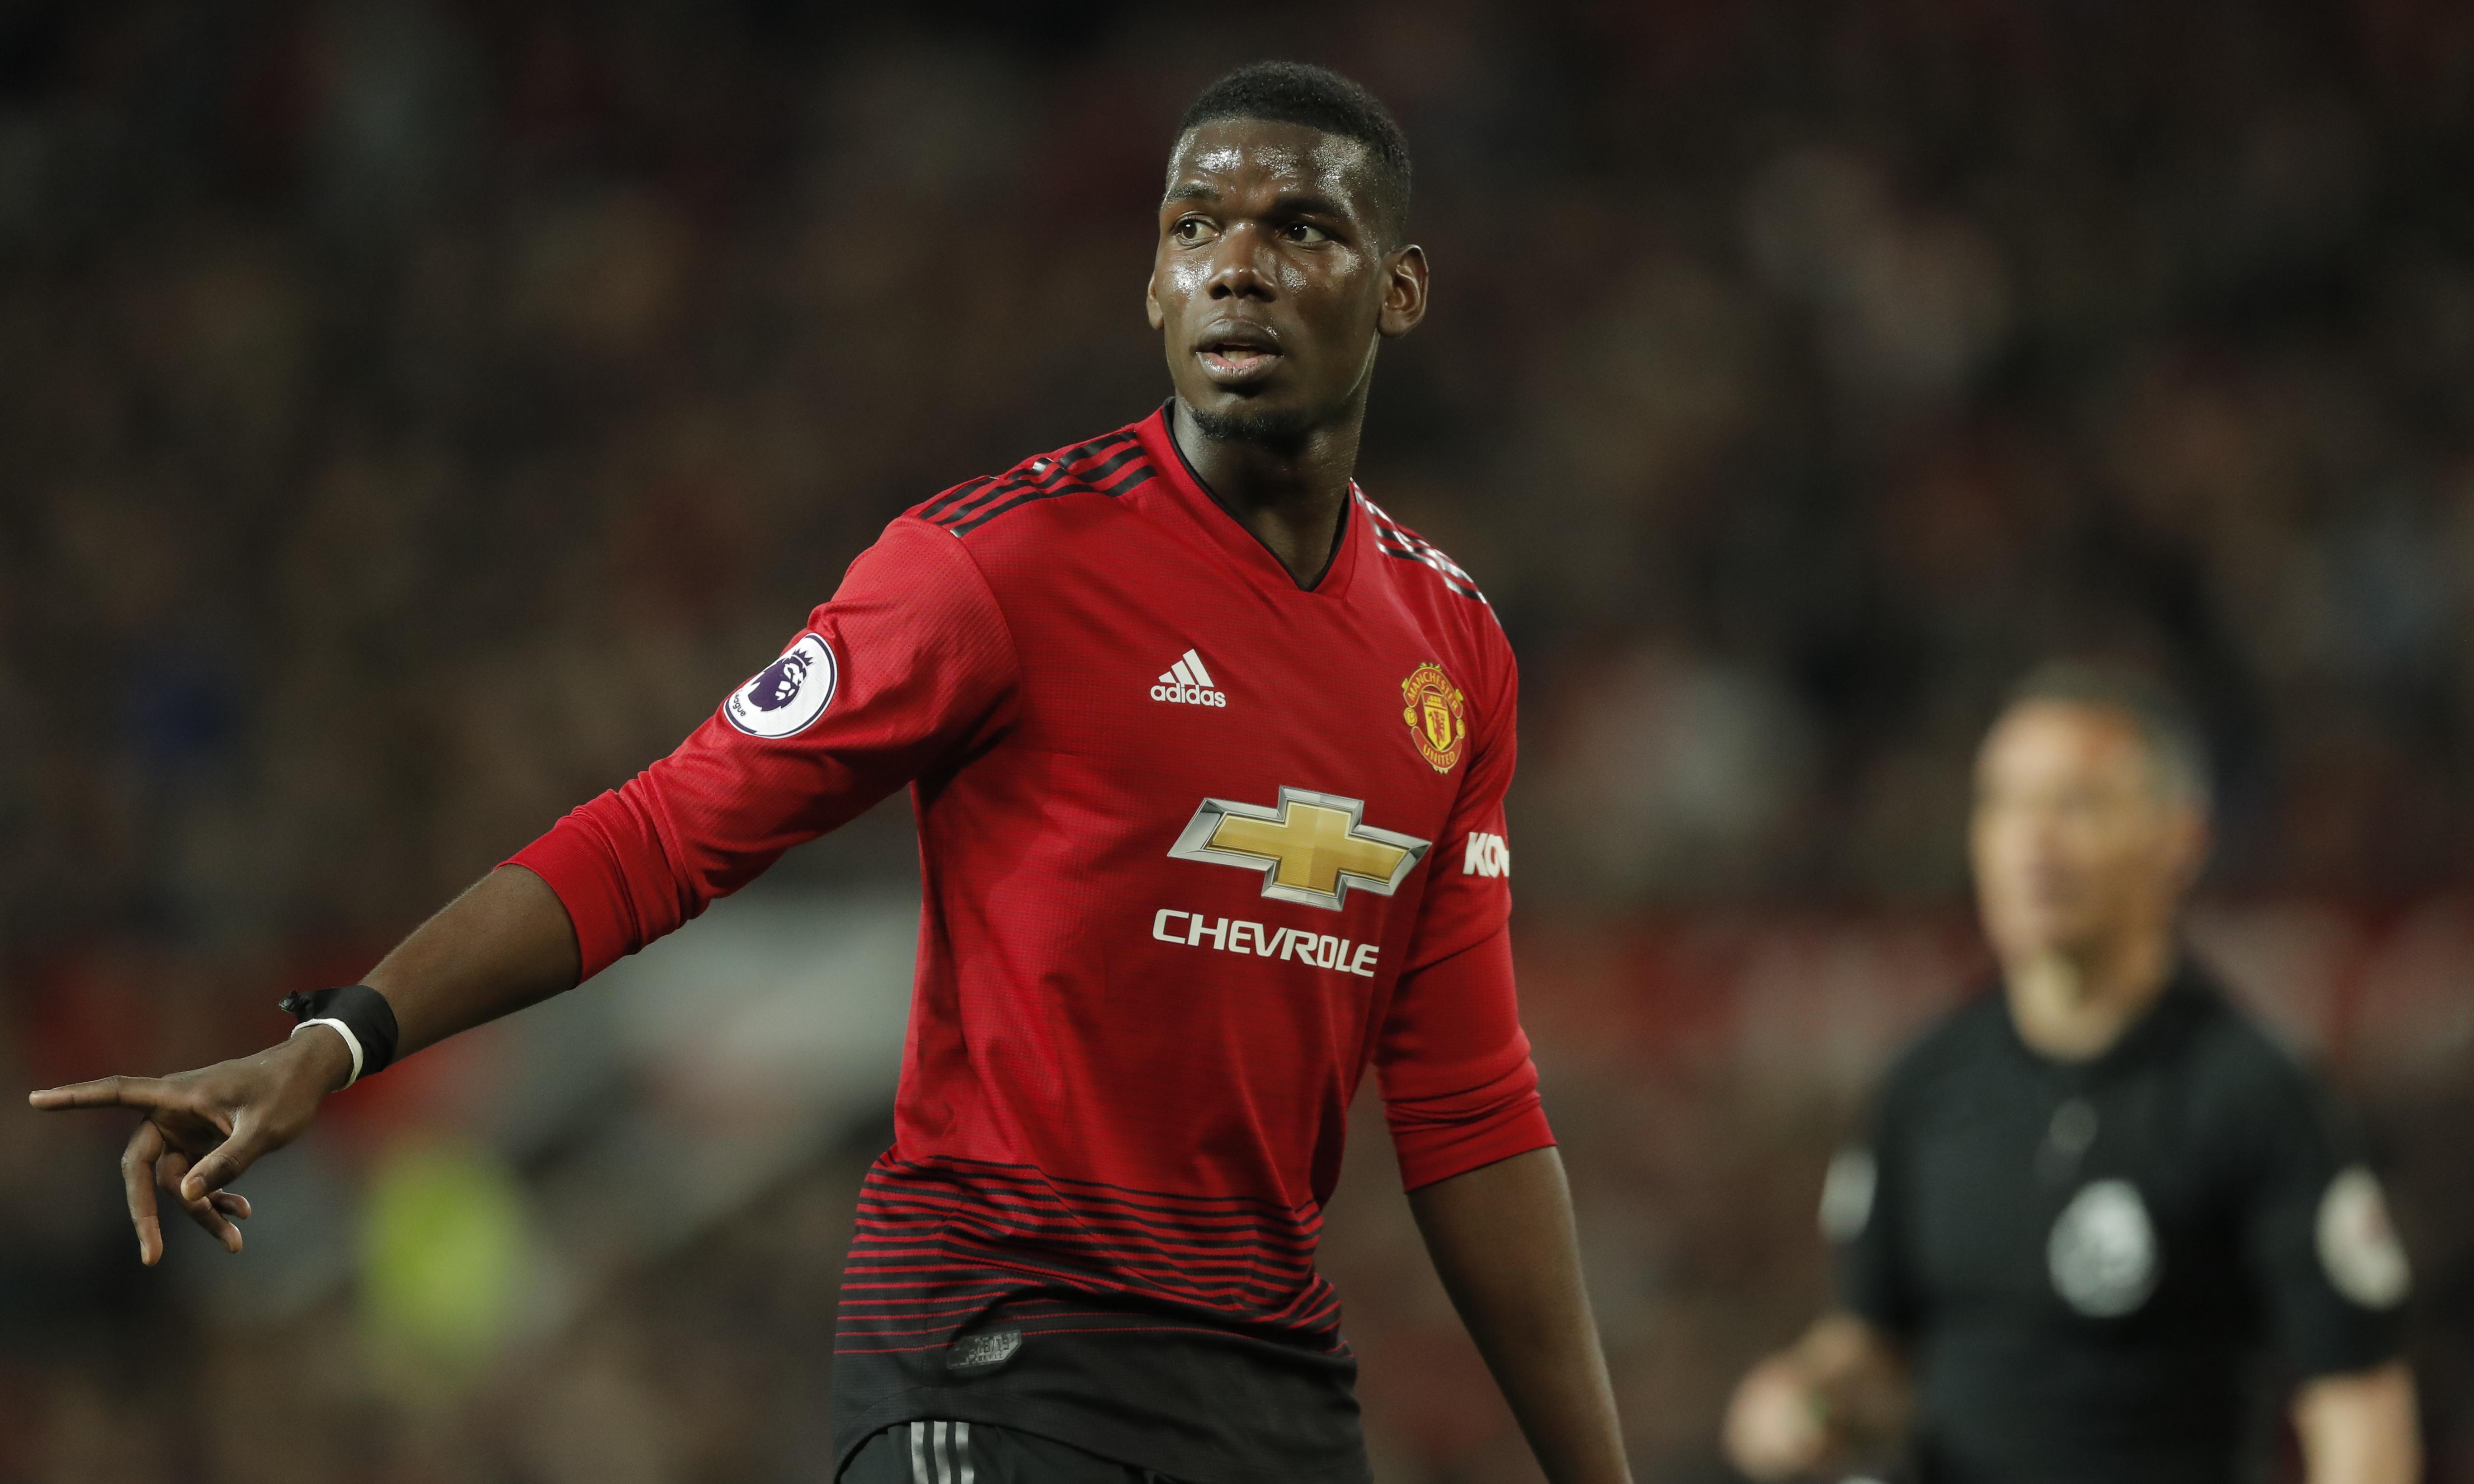 Paul Pogba arrives for Manchester United tour despite doubts over future